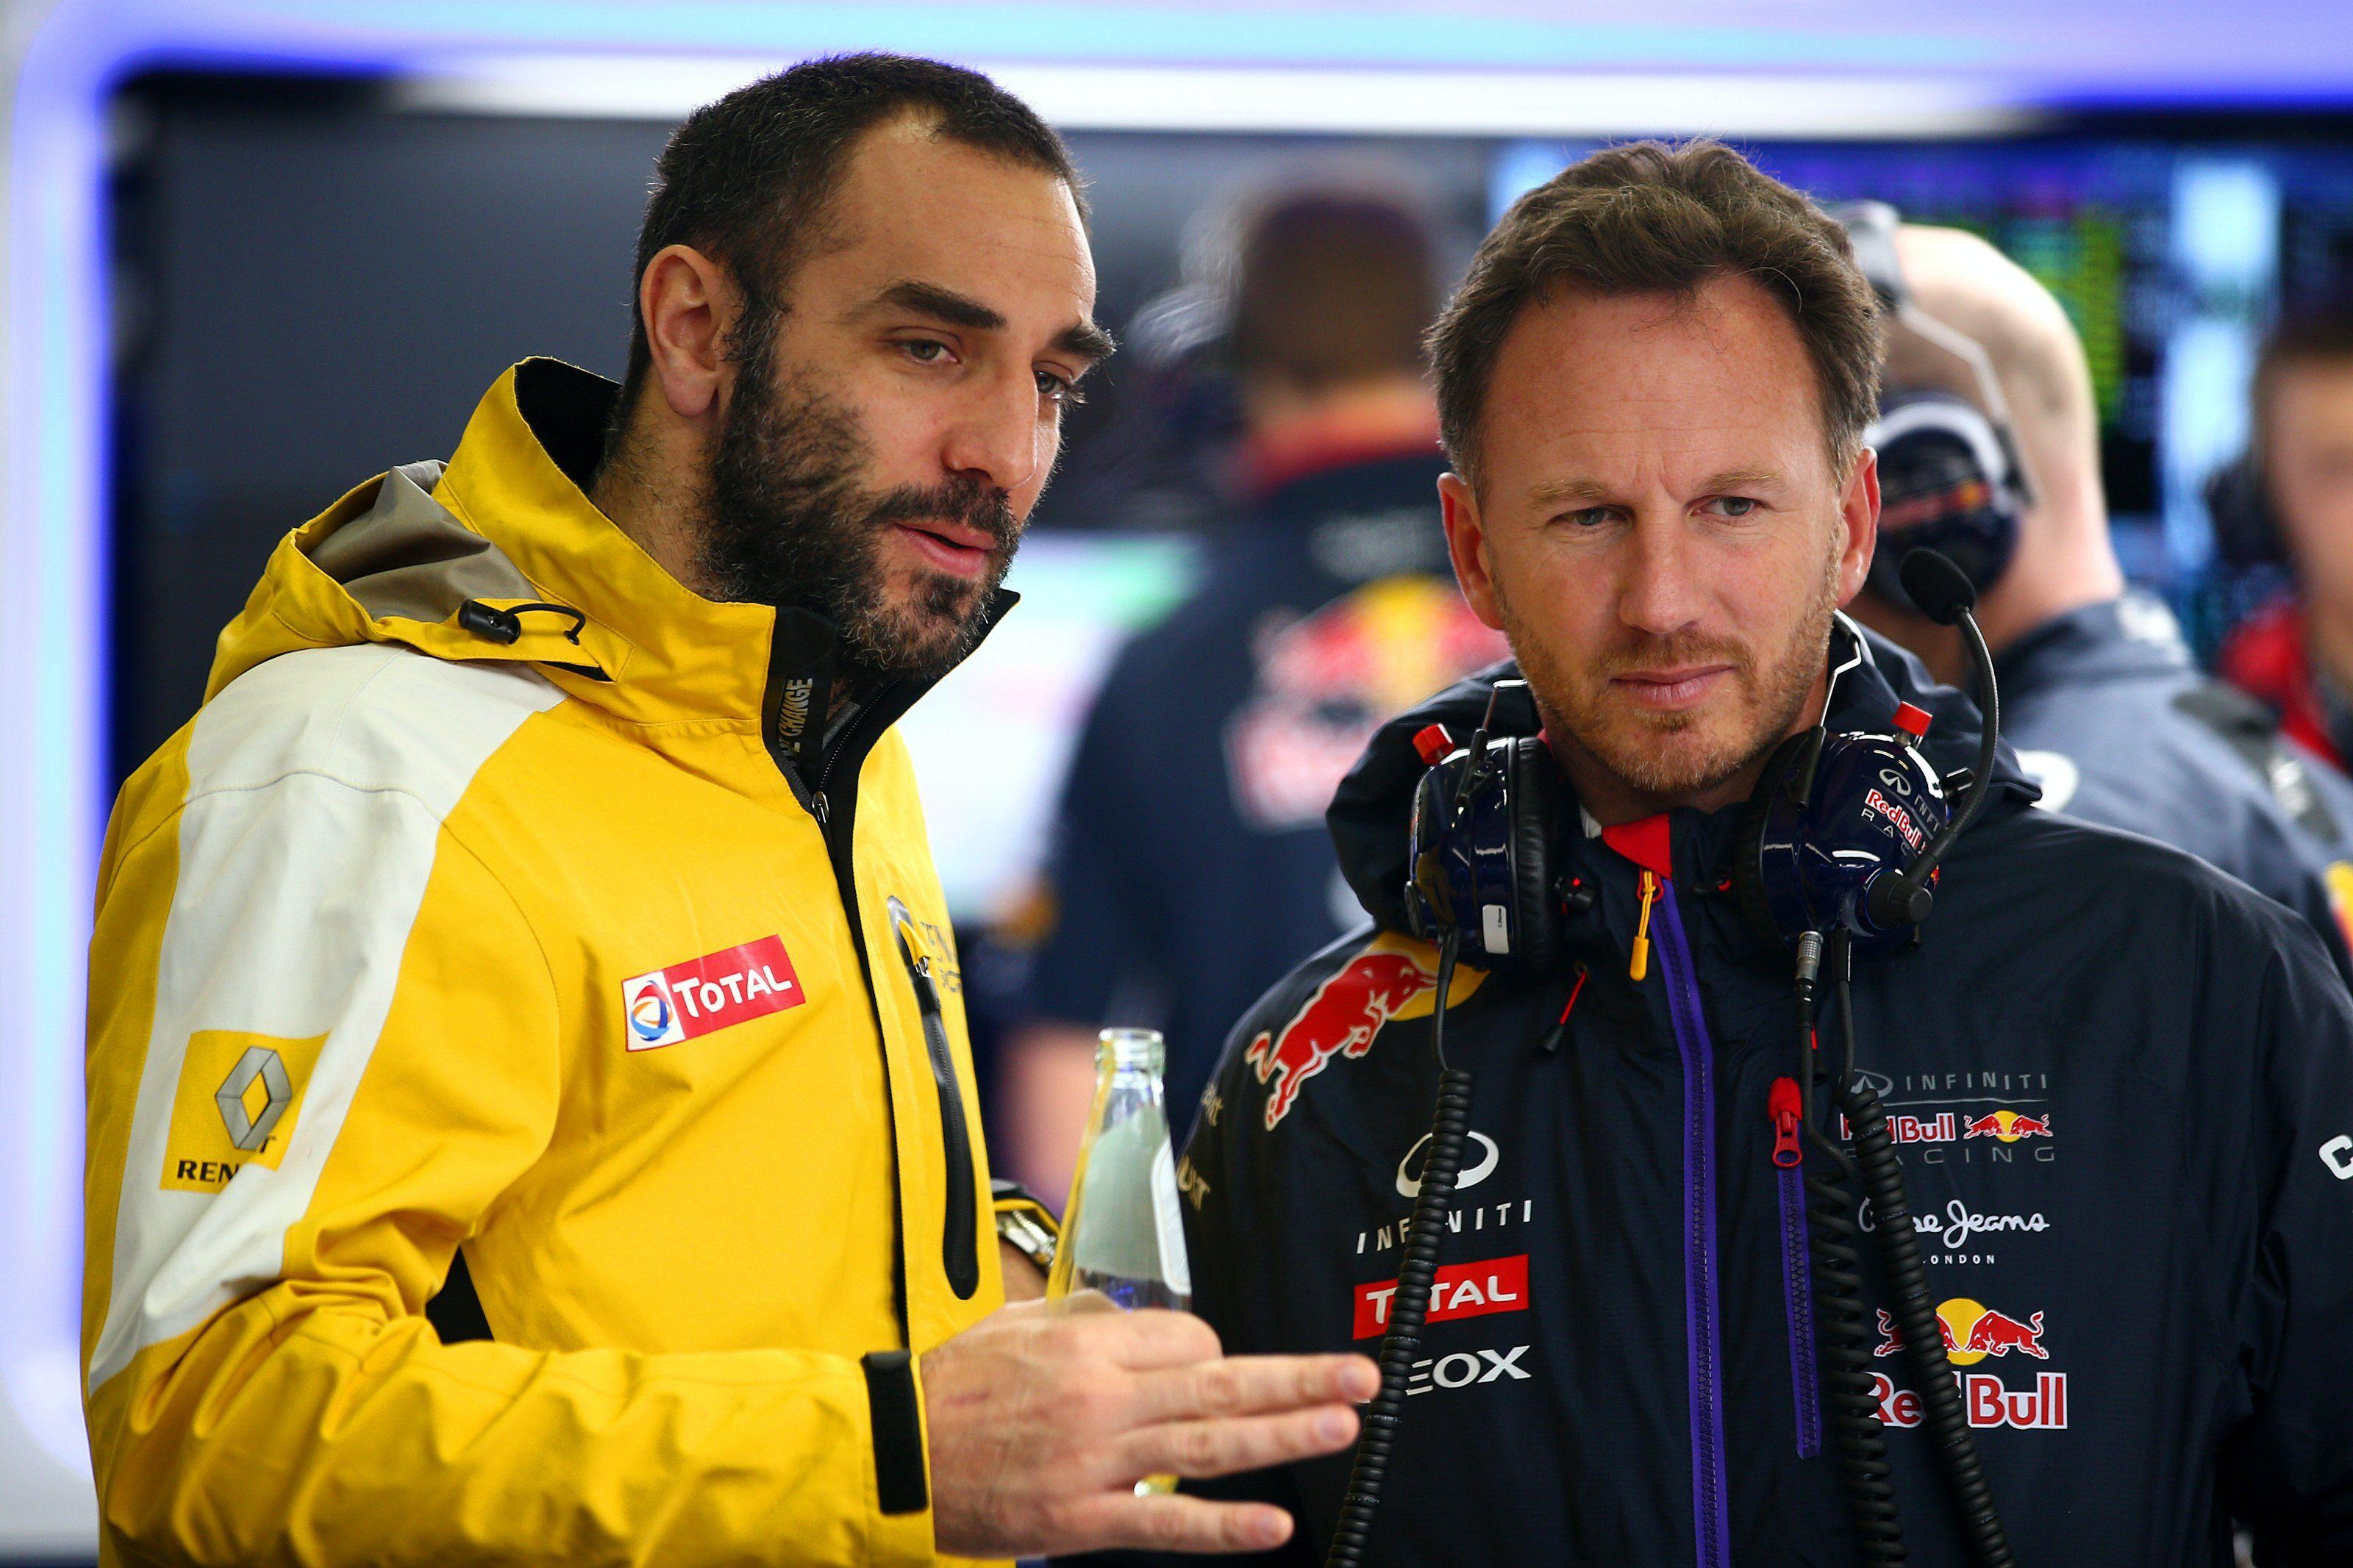 Red Bull Christian Horner with Renault Cyril Abiteboul, F1